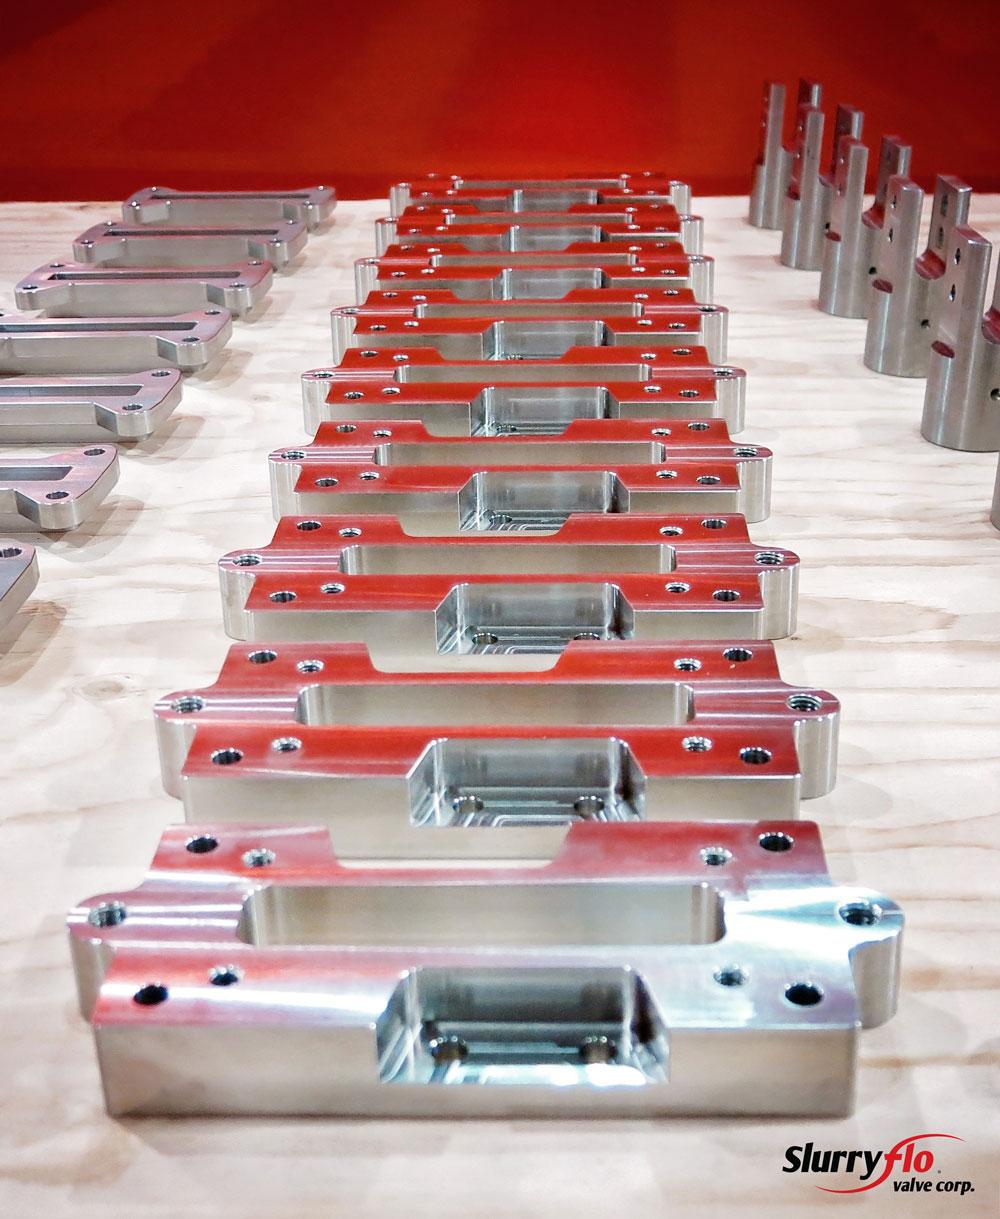 SlurryFlo control valve custom made components